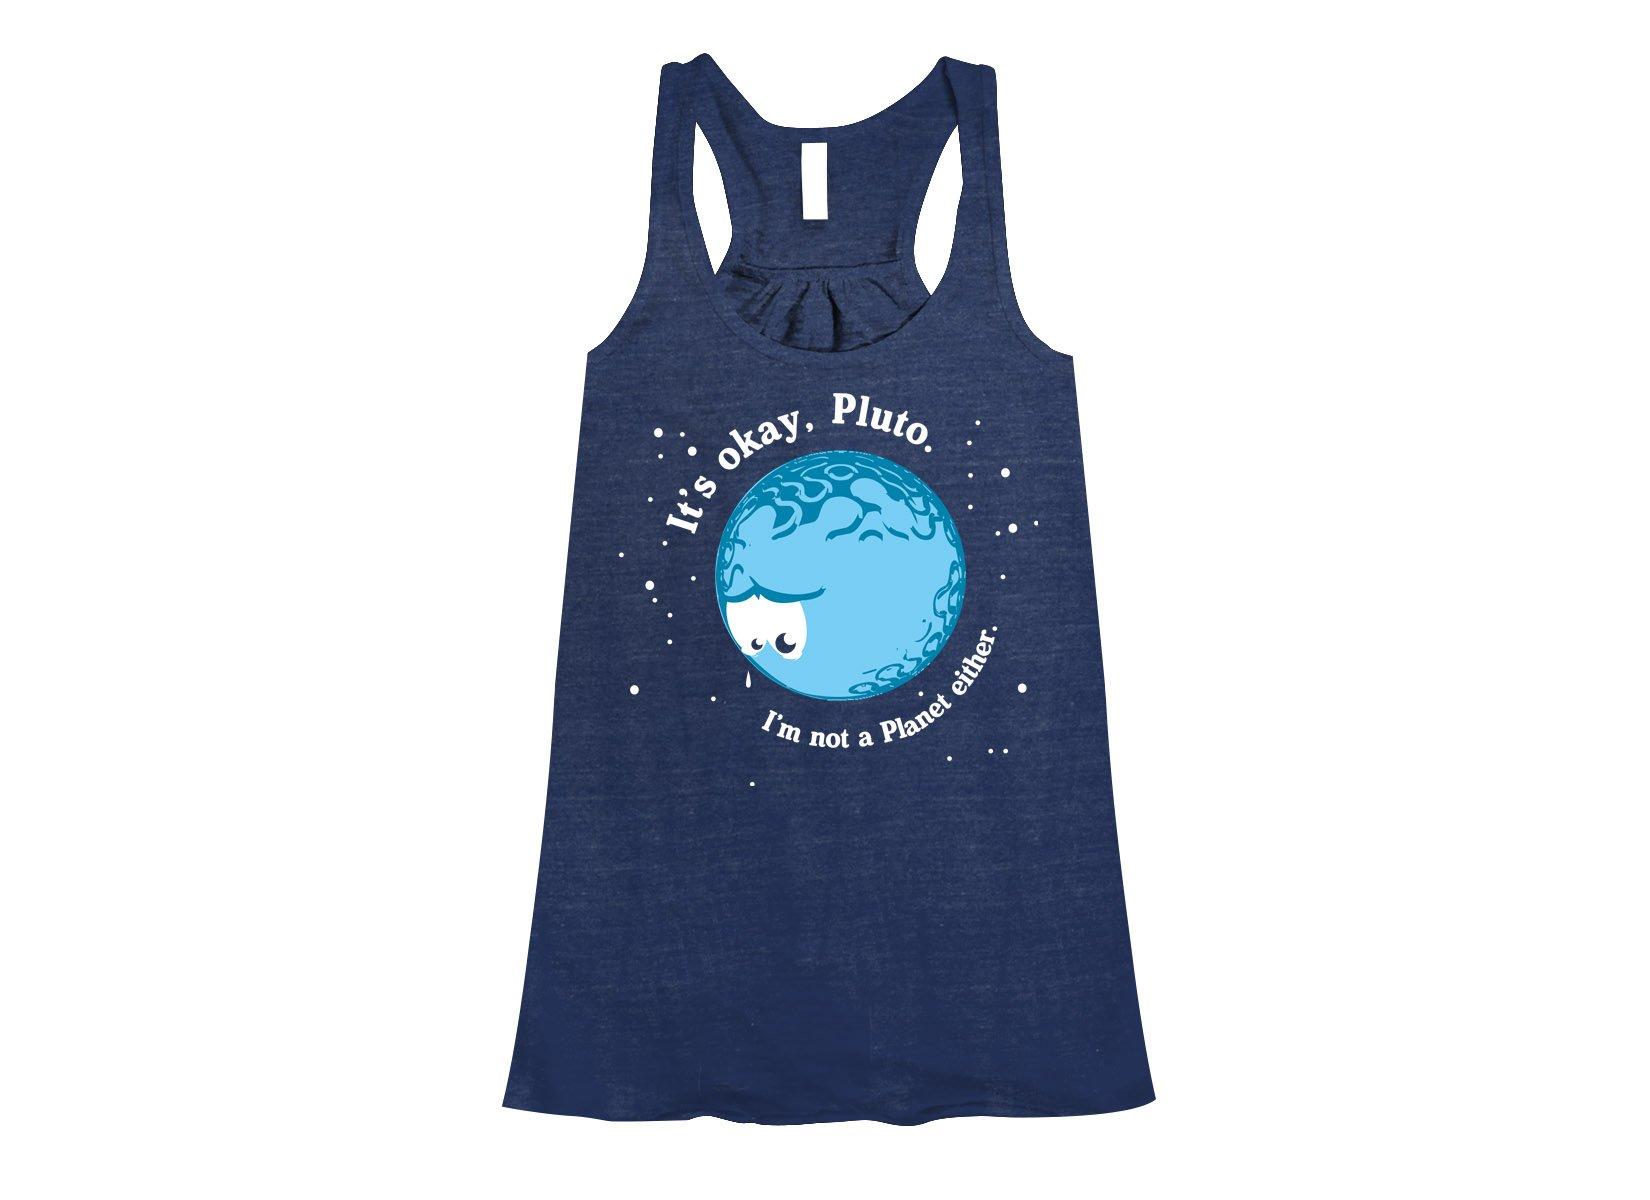 It's Okay Pluto on Womens Tanks T-Shirt